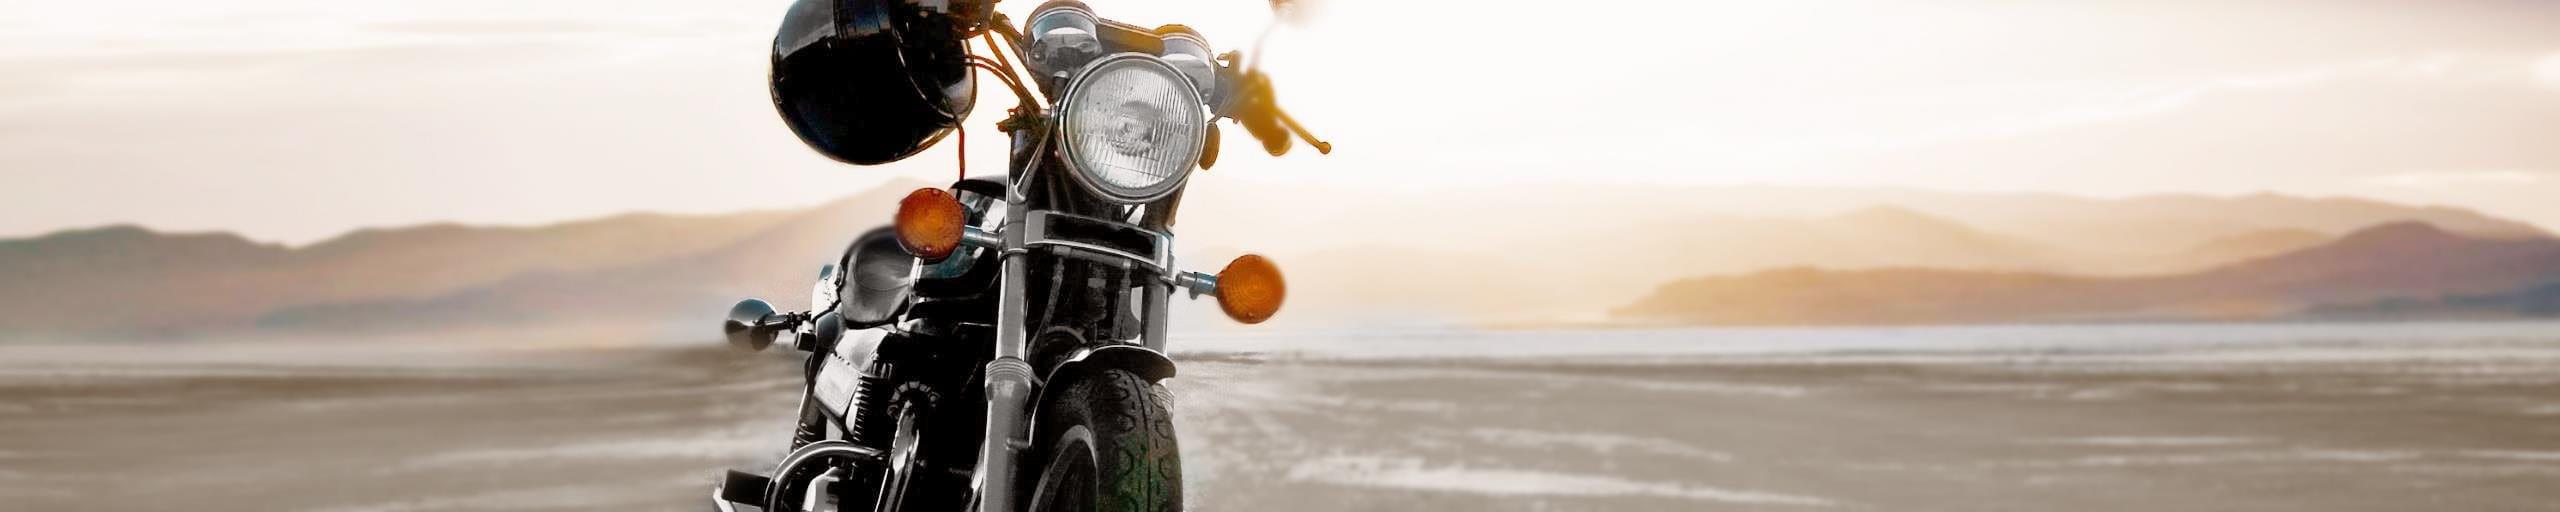 Moto nel paesaggio